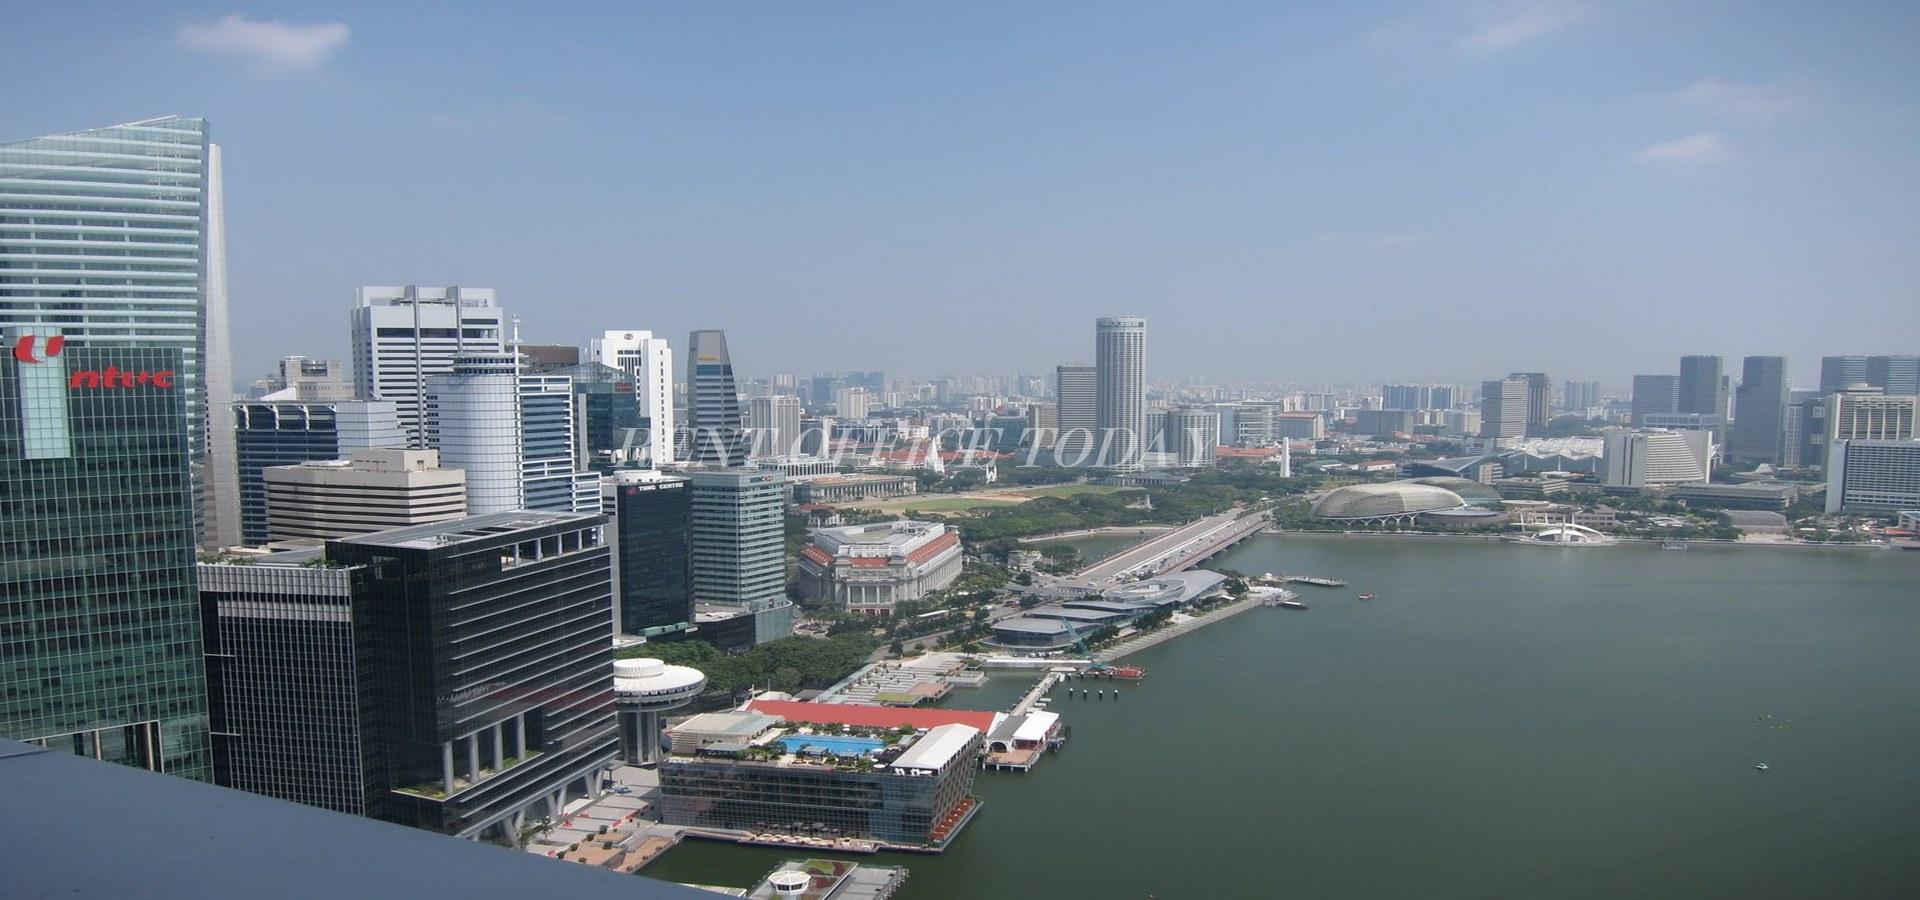 бизнес центр marina bay financial centre-8